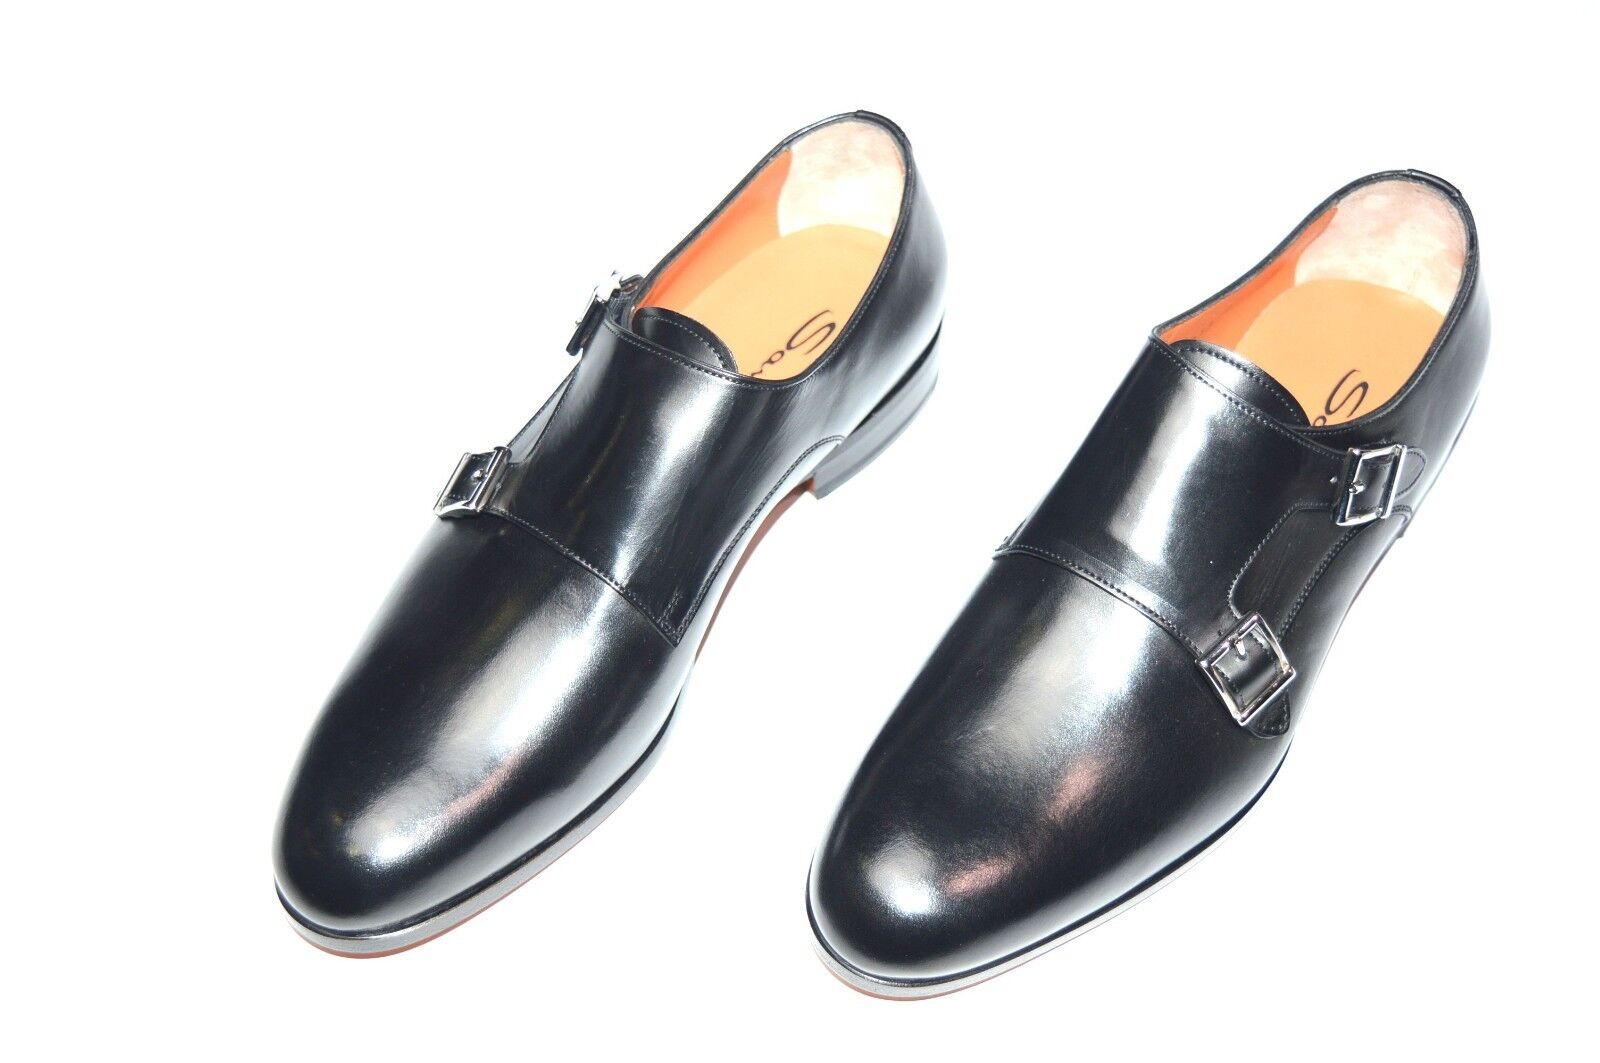 NEW SANTONI Dress Pelle Shoes Monk Strap SIZE Eu 44 Uk 10 Us 11 (23R)